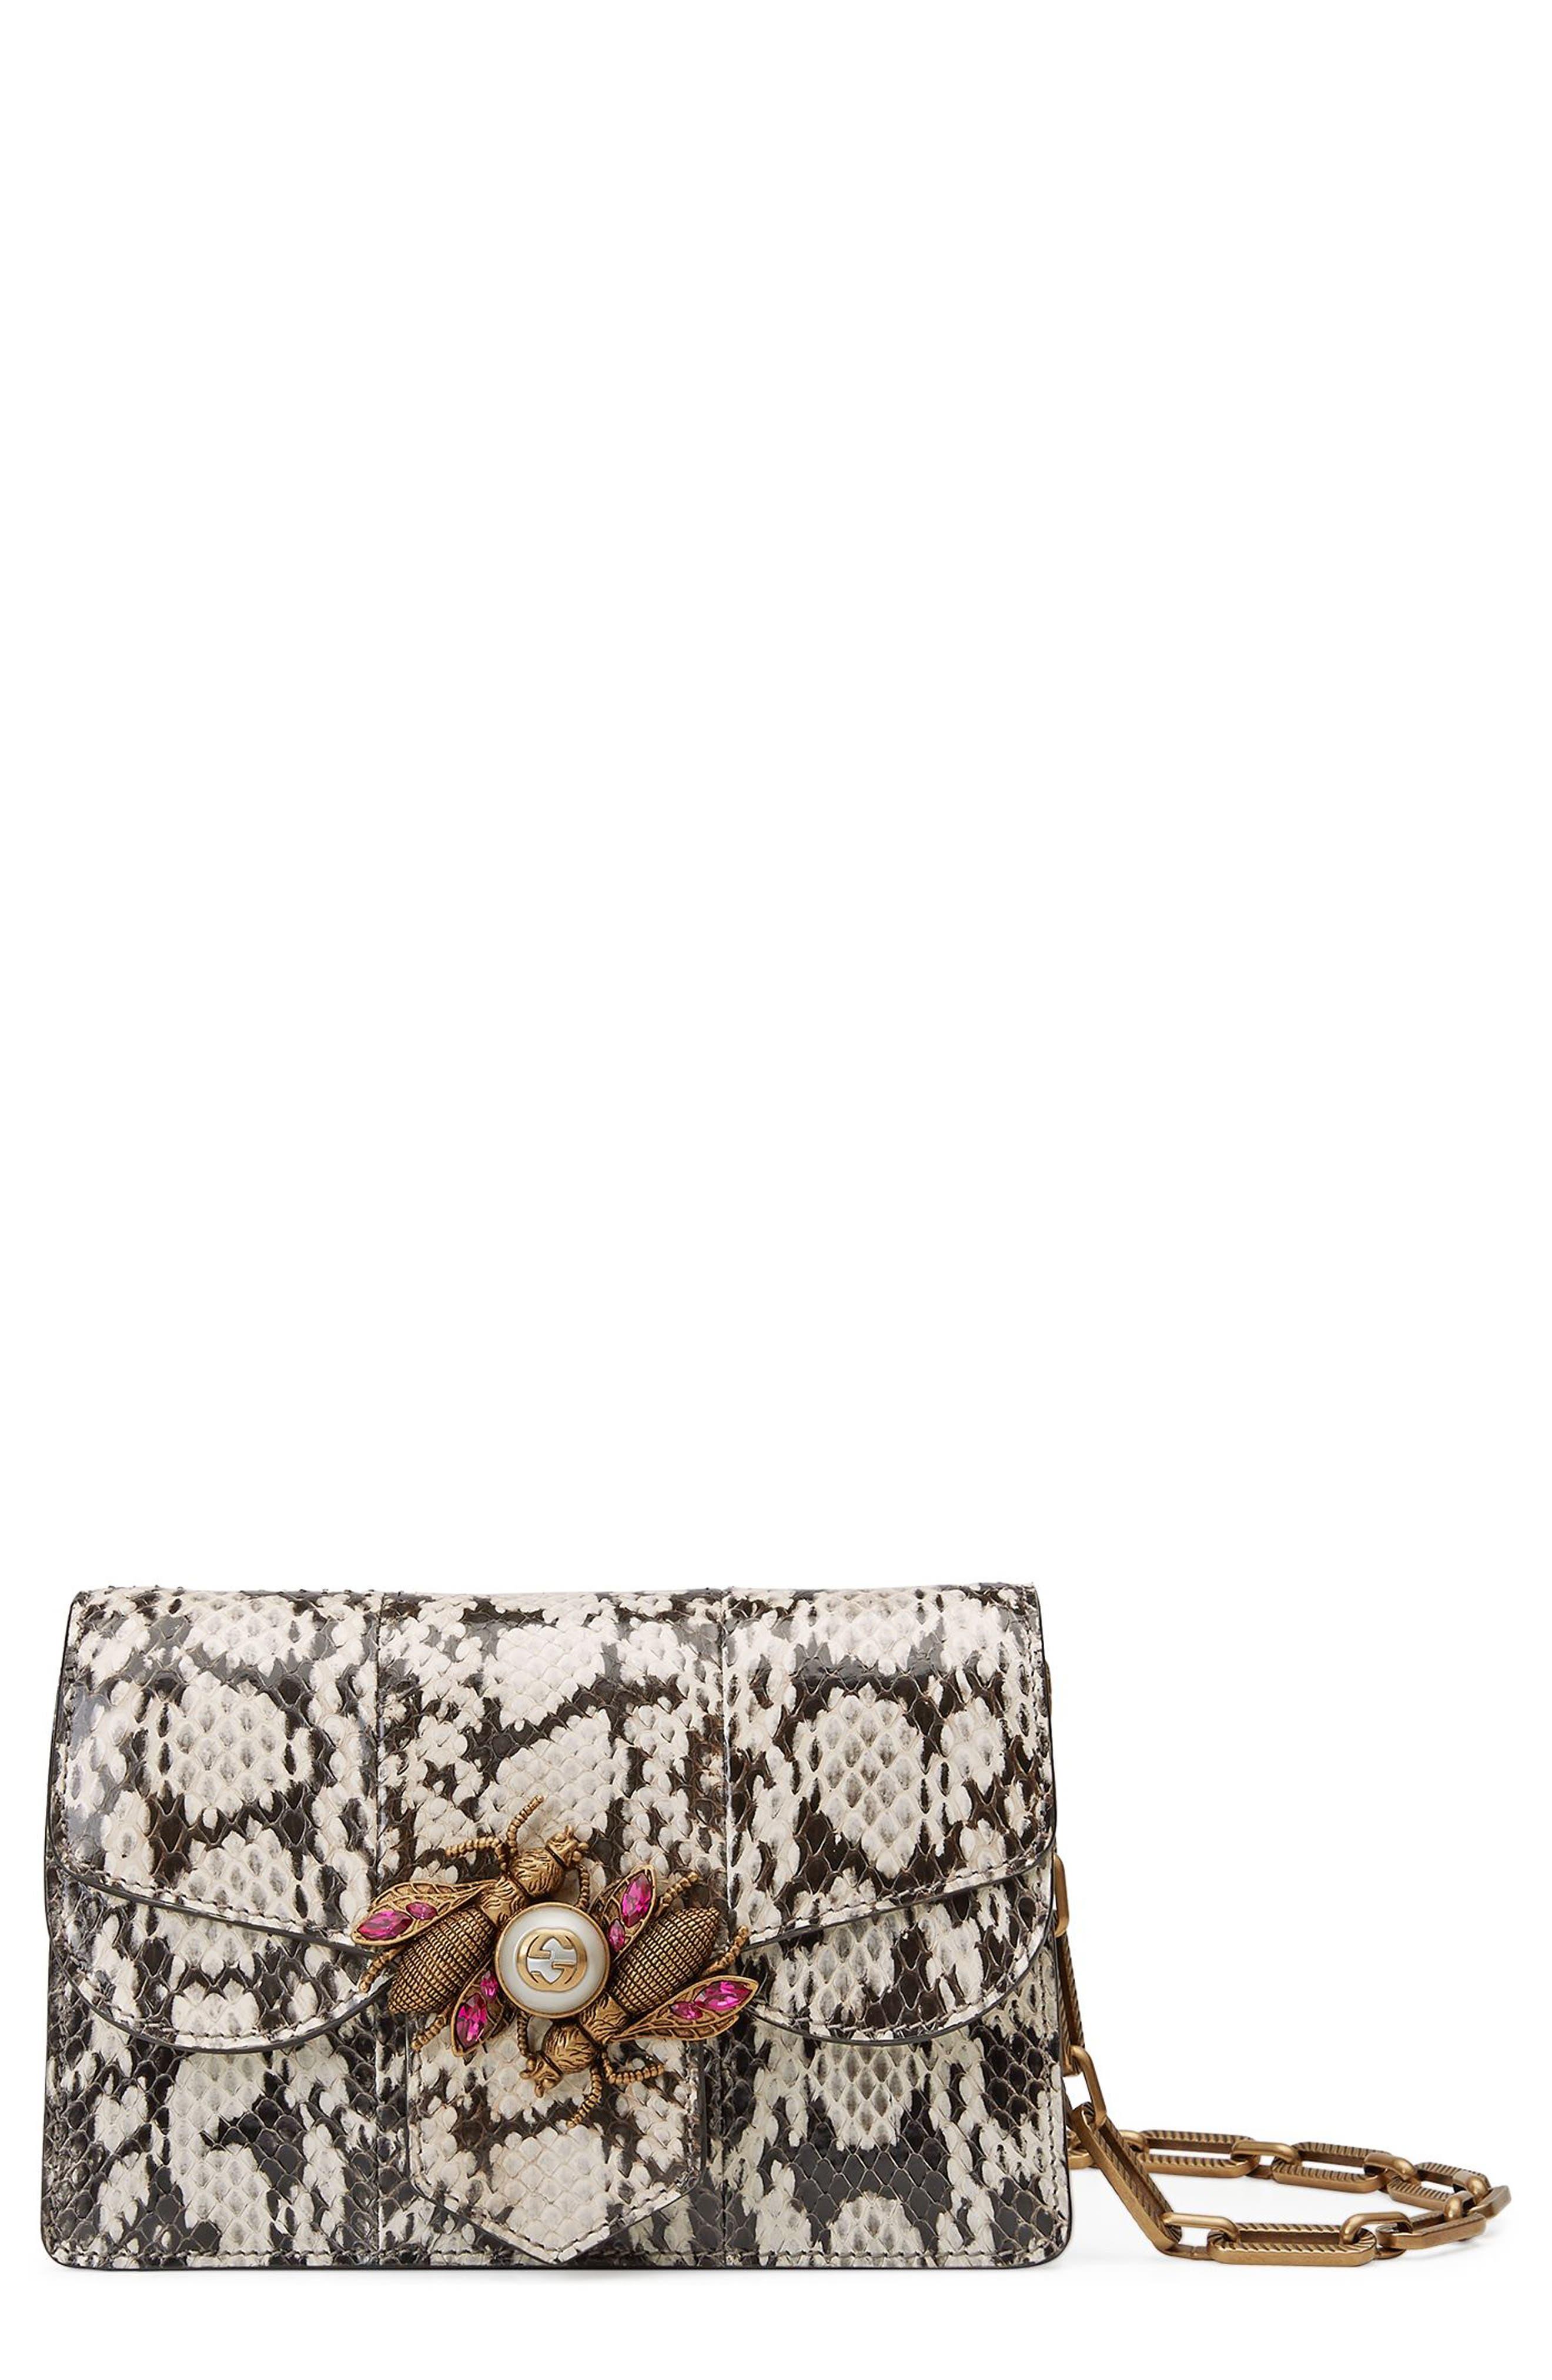 Gucci Mini Broadway Bee Genuine Snakeskin Shoulder Bag